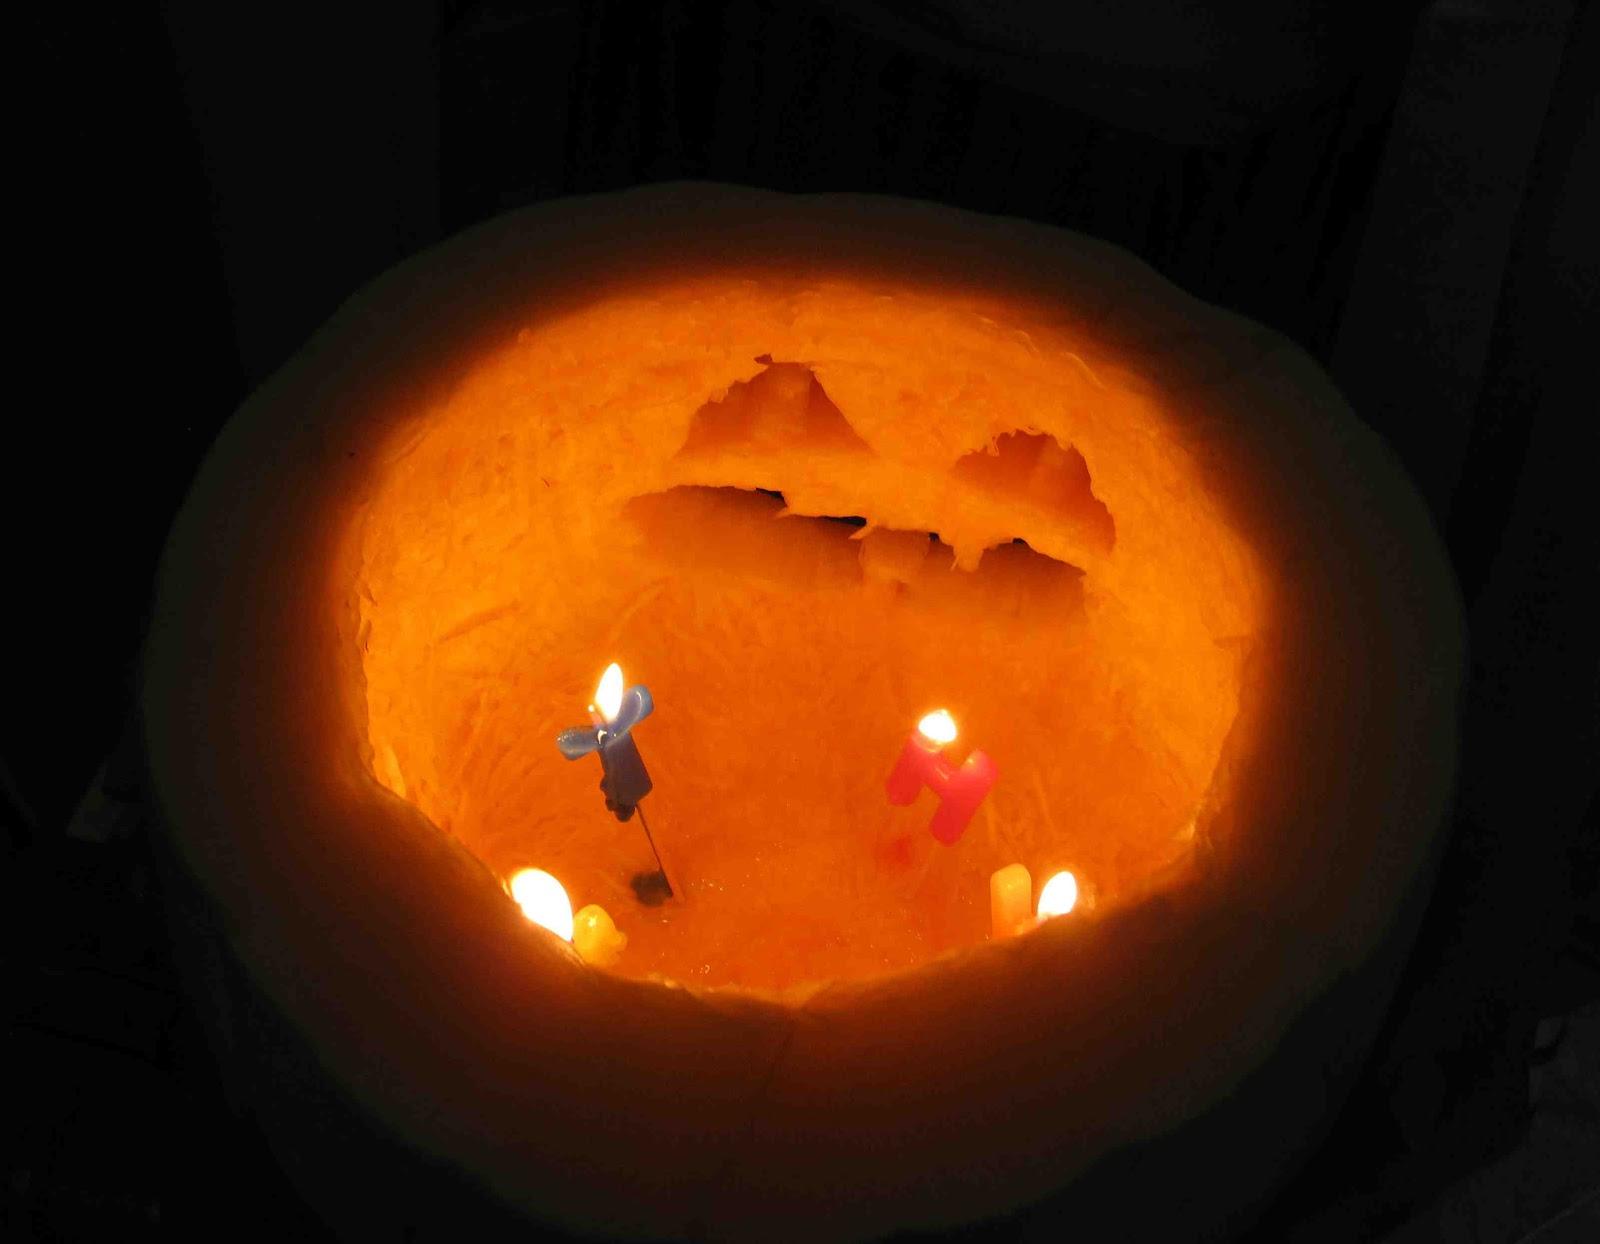 Janelle in egypt carving jack o lanters edfu november